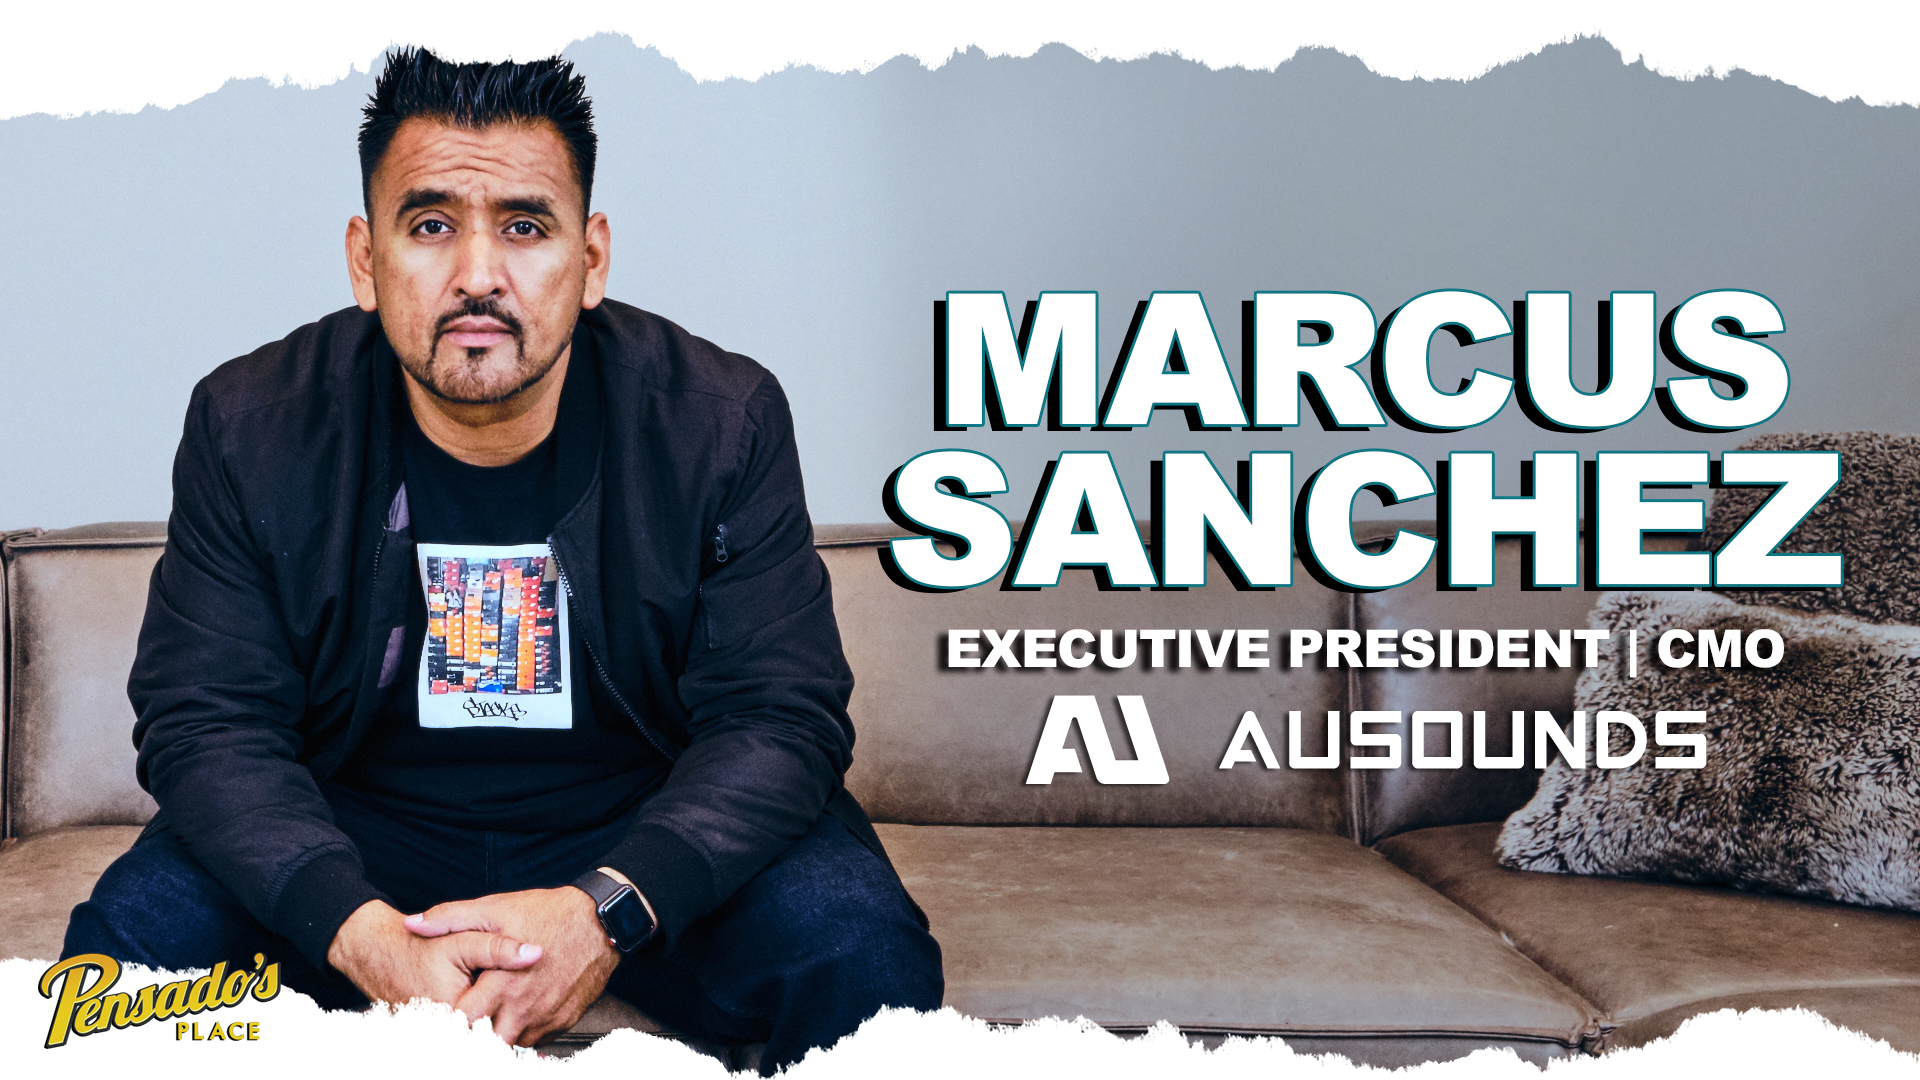 AuSounds Executive President / CMO, Marcus Sanchez